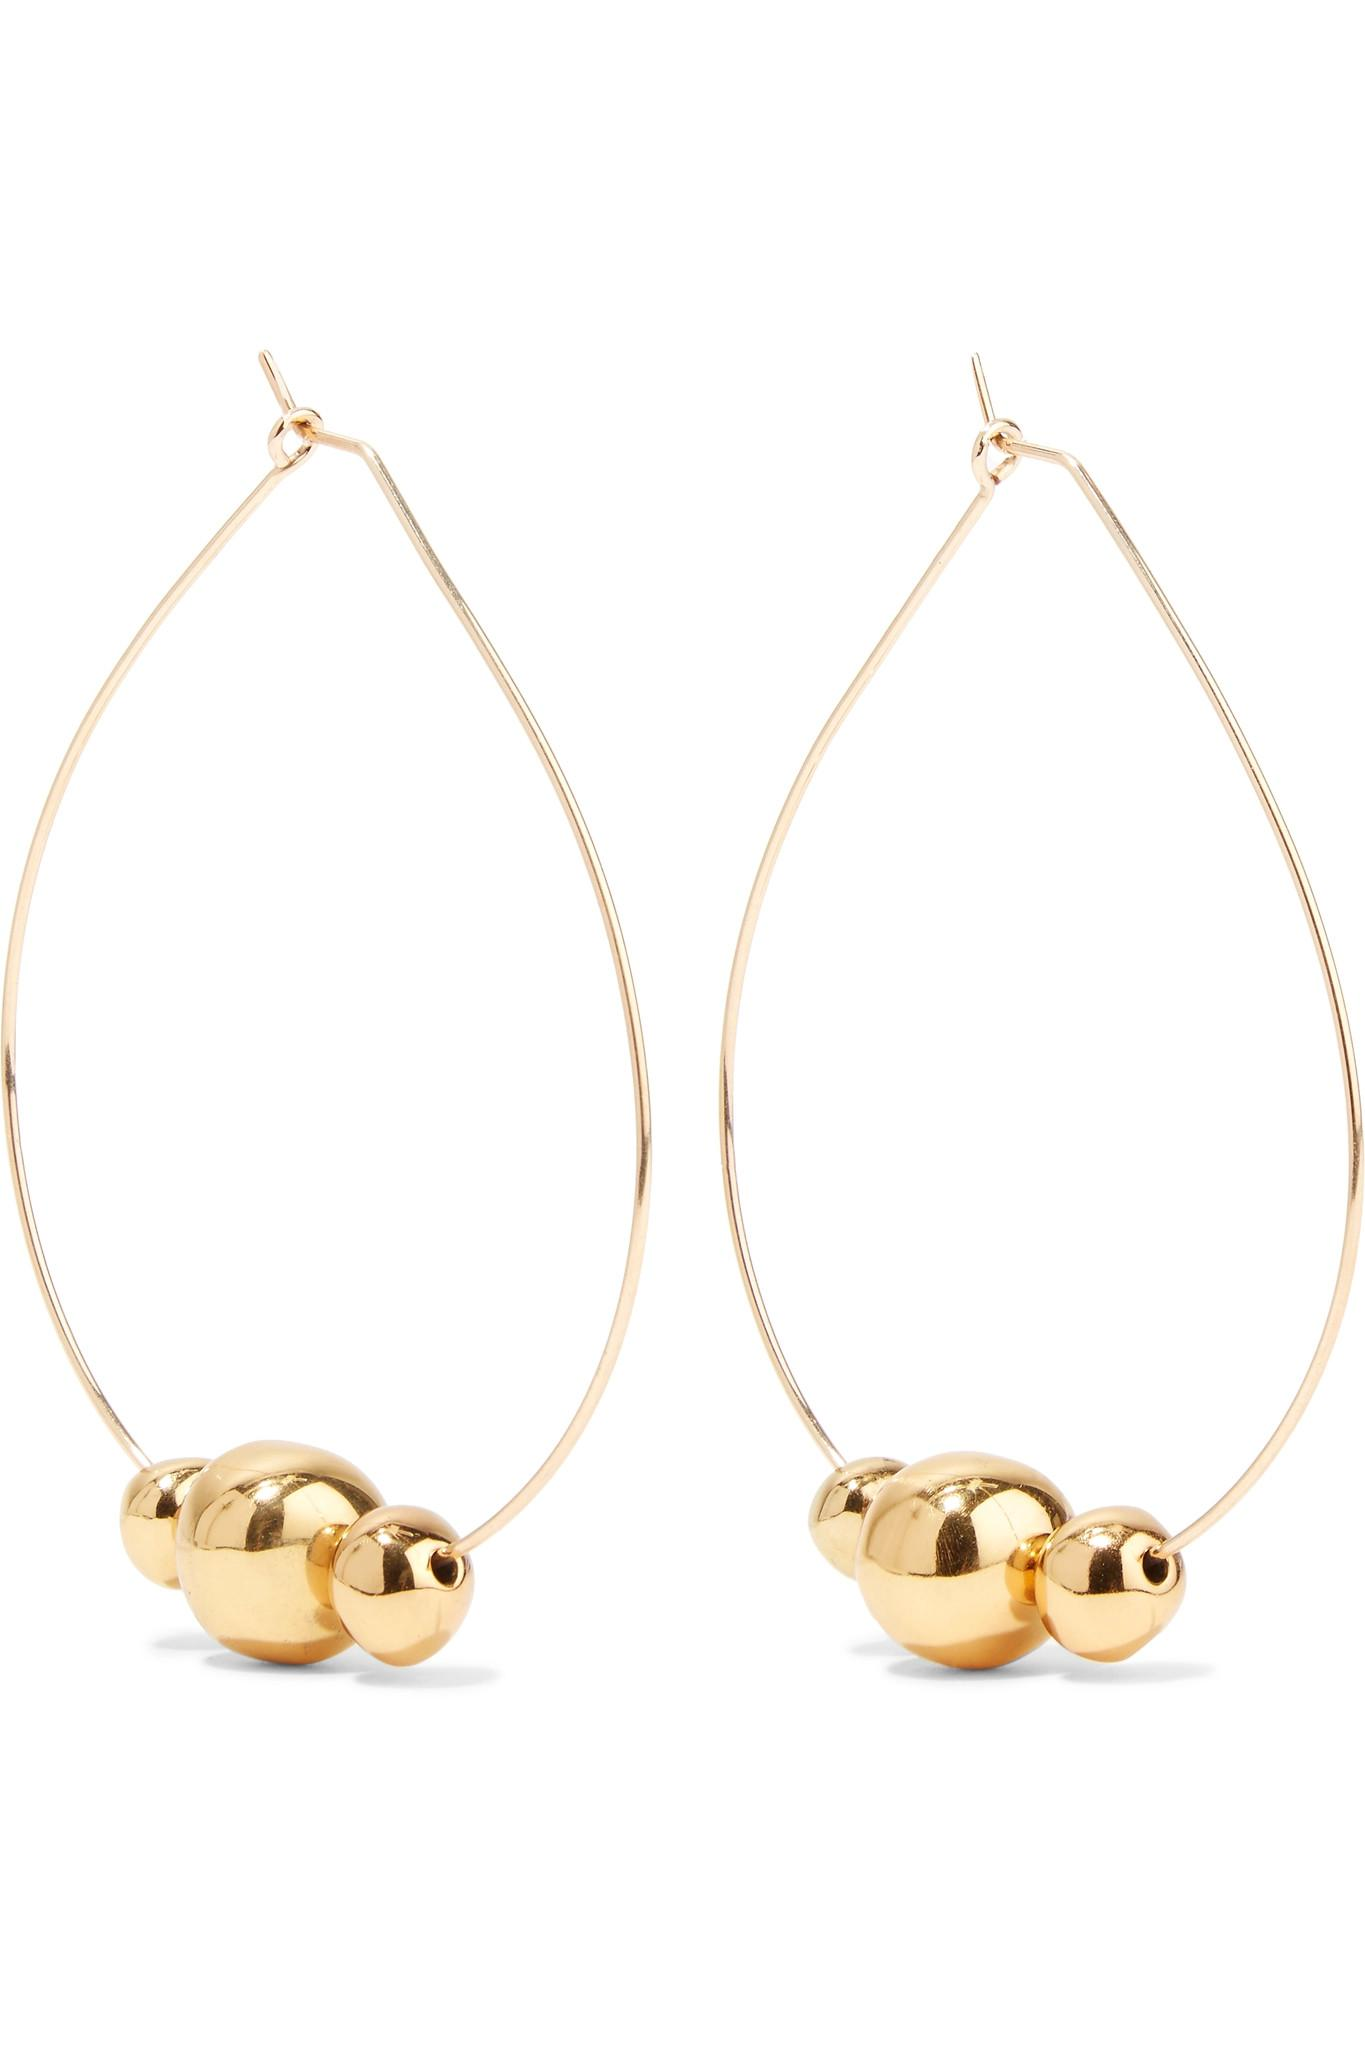 Dinosaur Designs Mineral Gold-plated Hoop Earrings liX6x